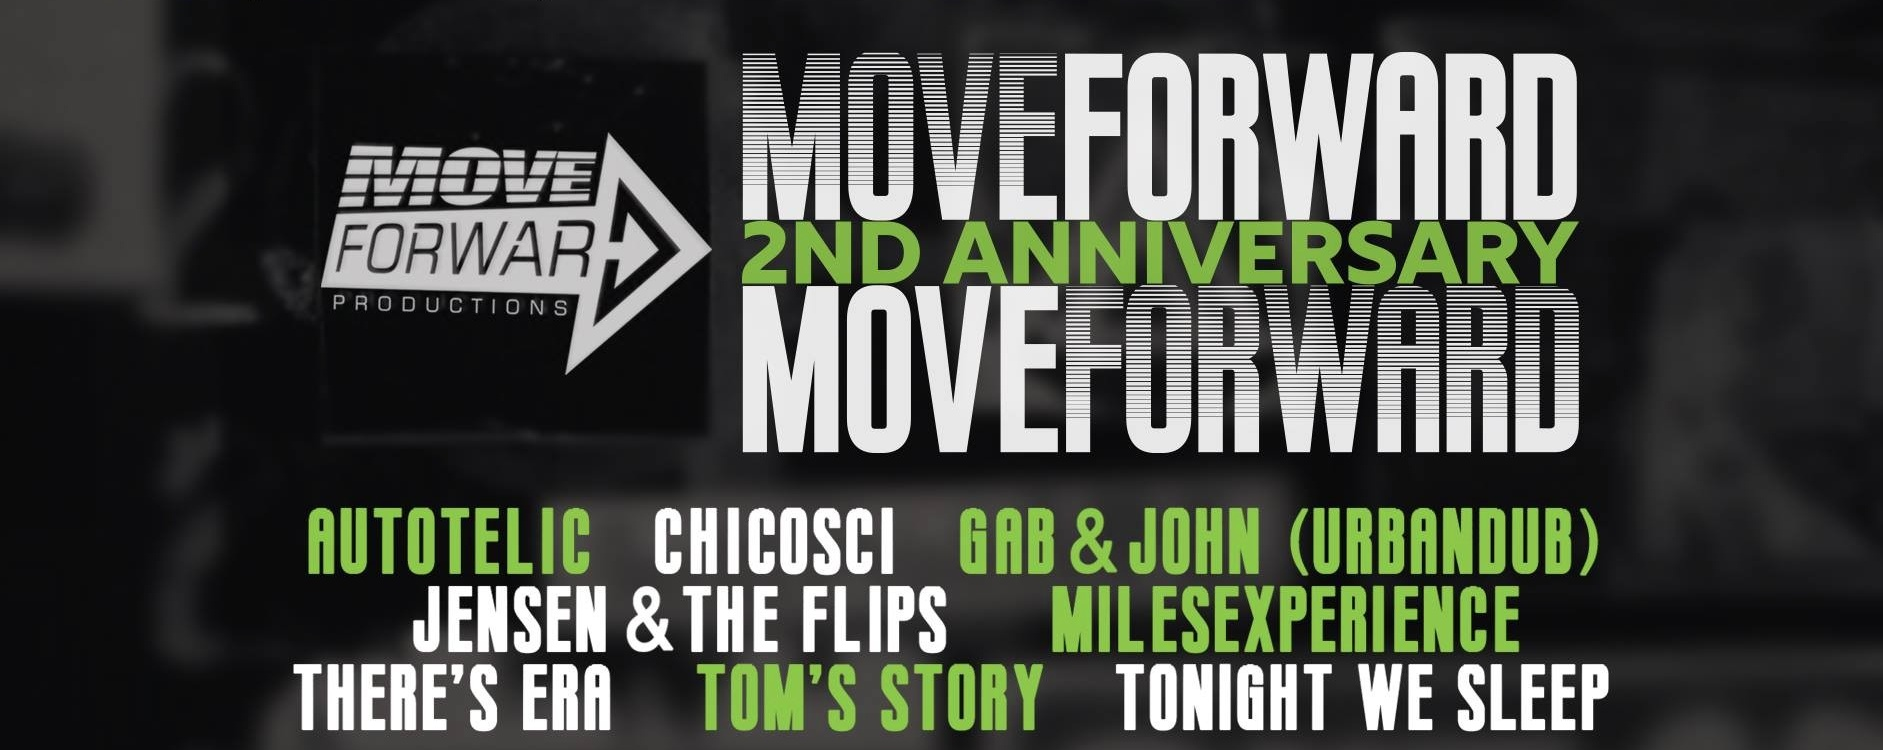 Move Forward 2nd Anniversary